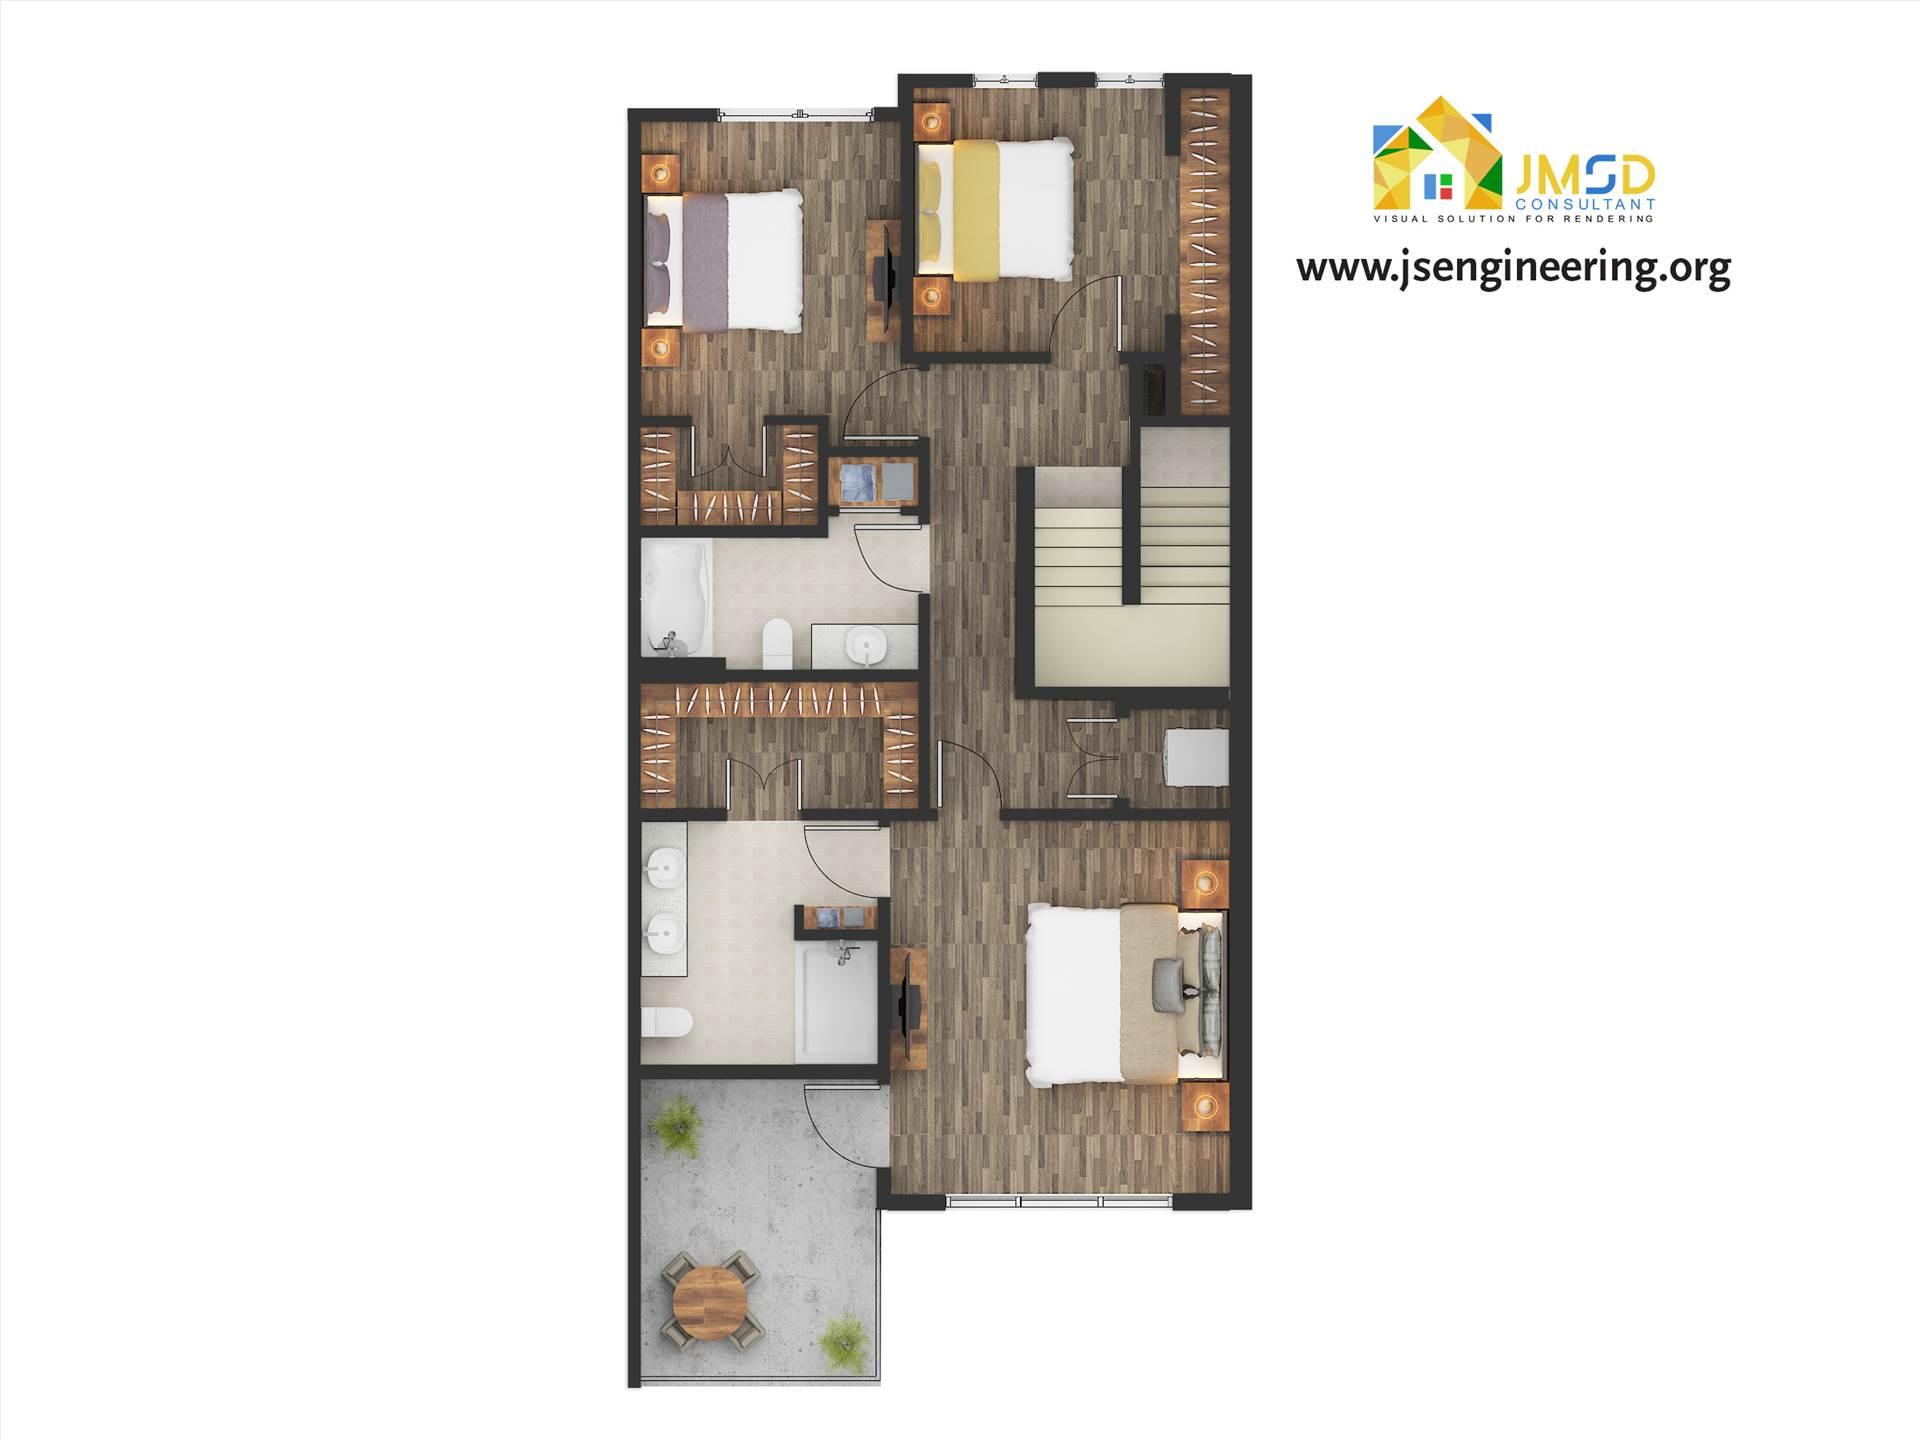 Floor Plan Design Services Color 2D Floor Plan Rendering for Marketing. by JMSDCONSULTANT